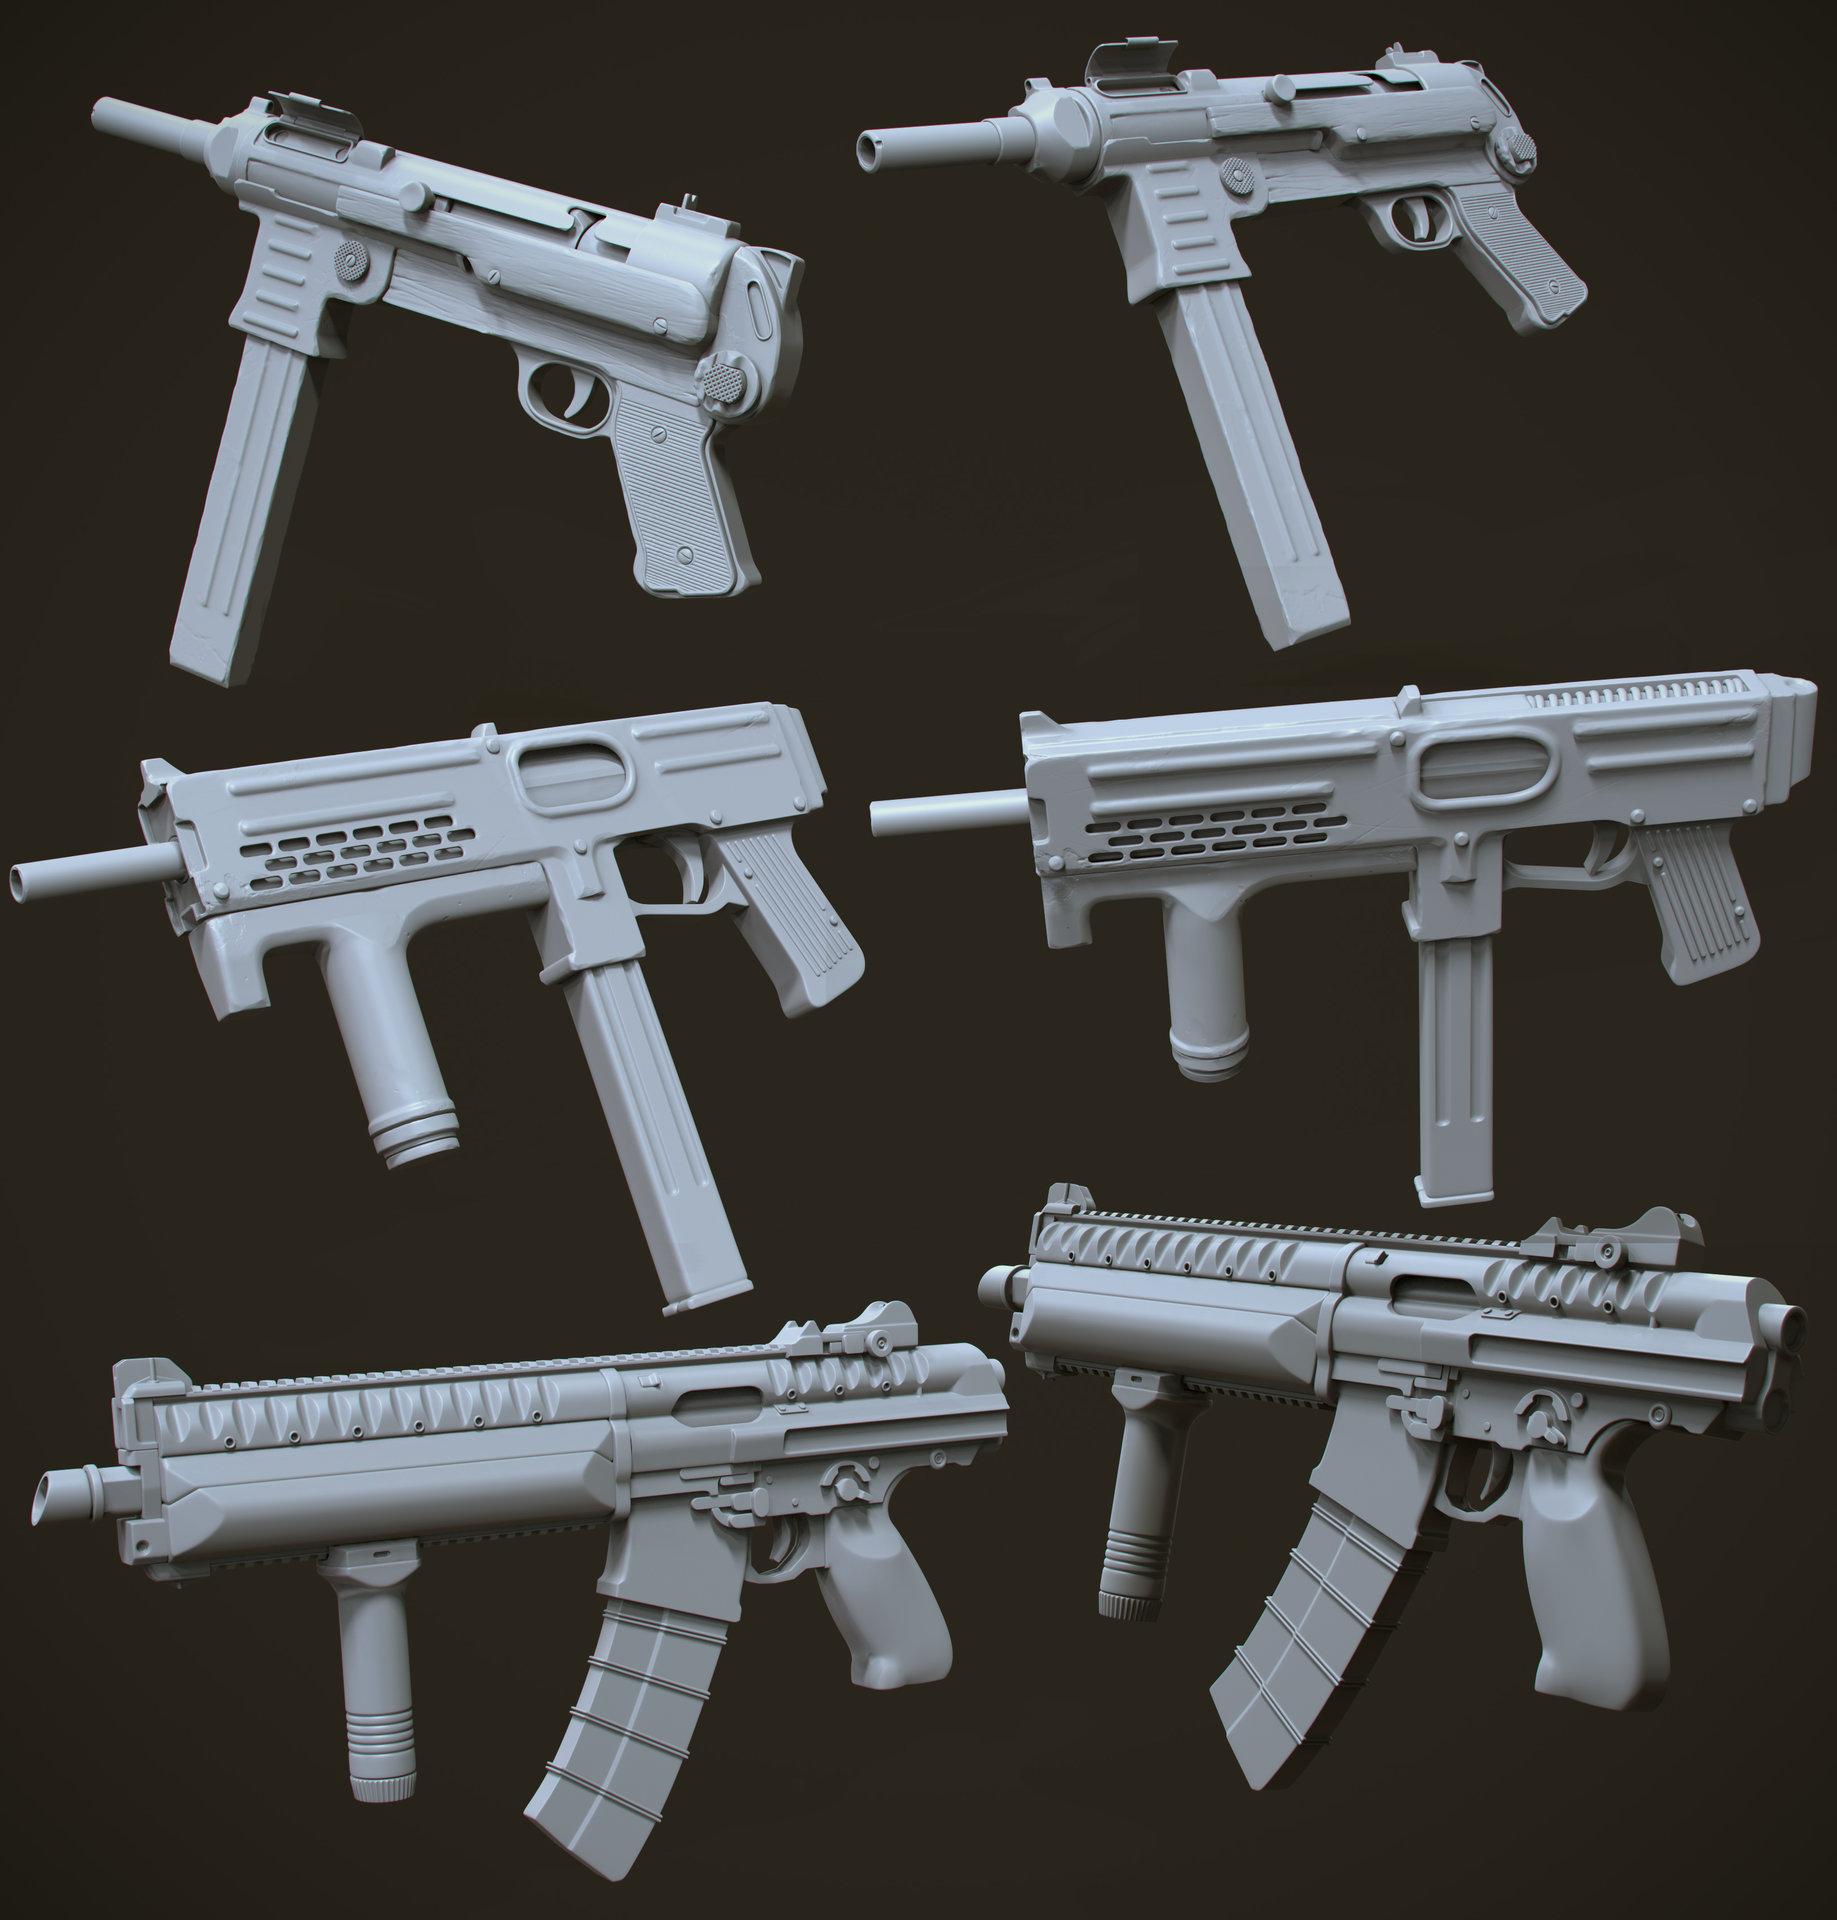 dieselpunk weapons 52663 interiordesign